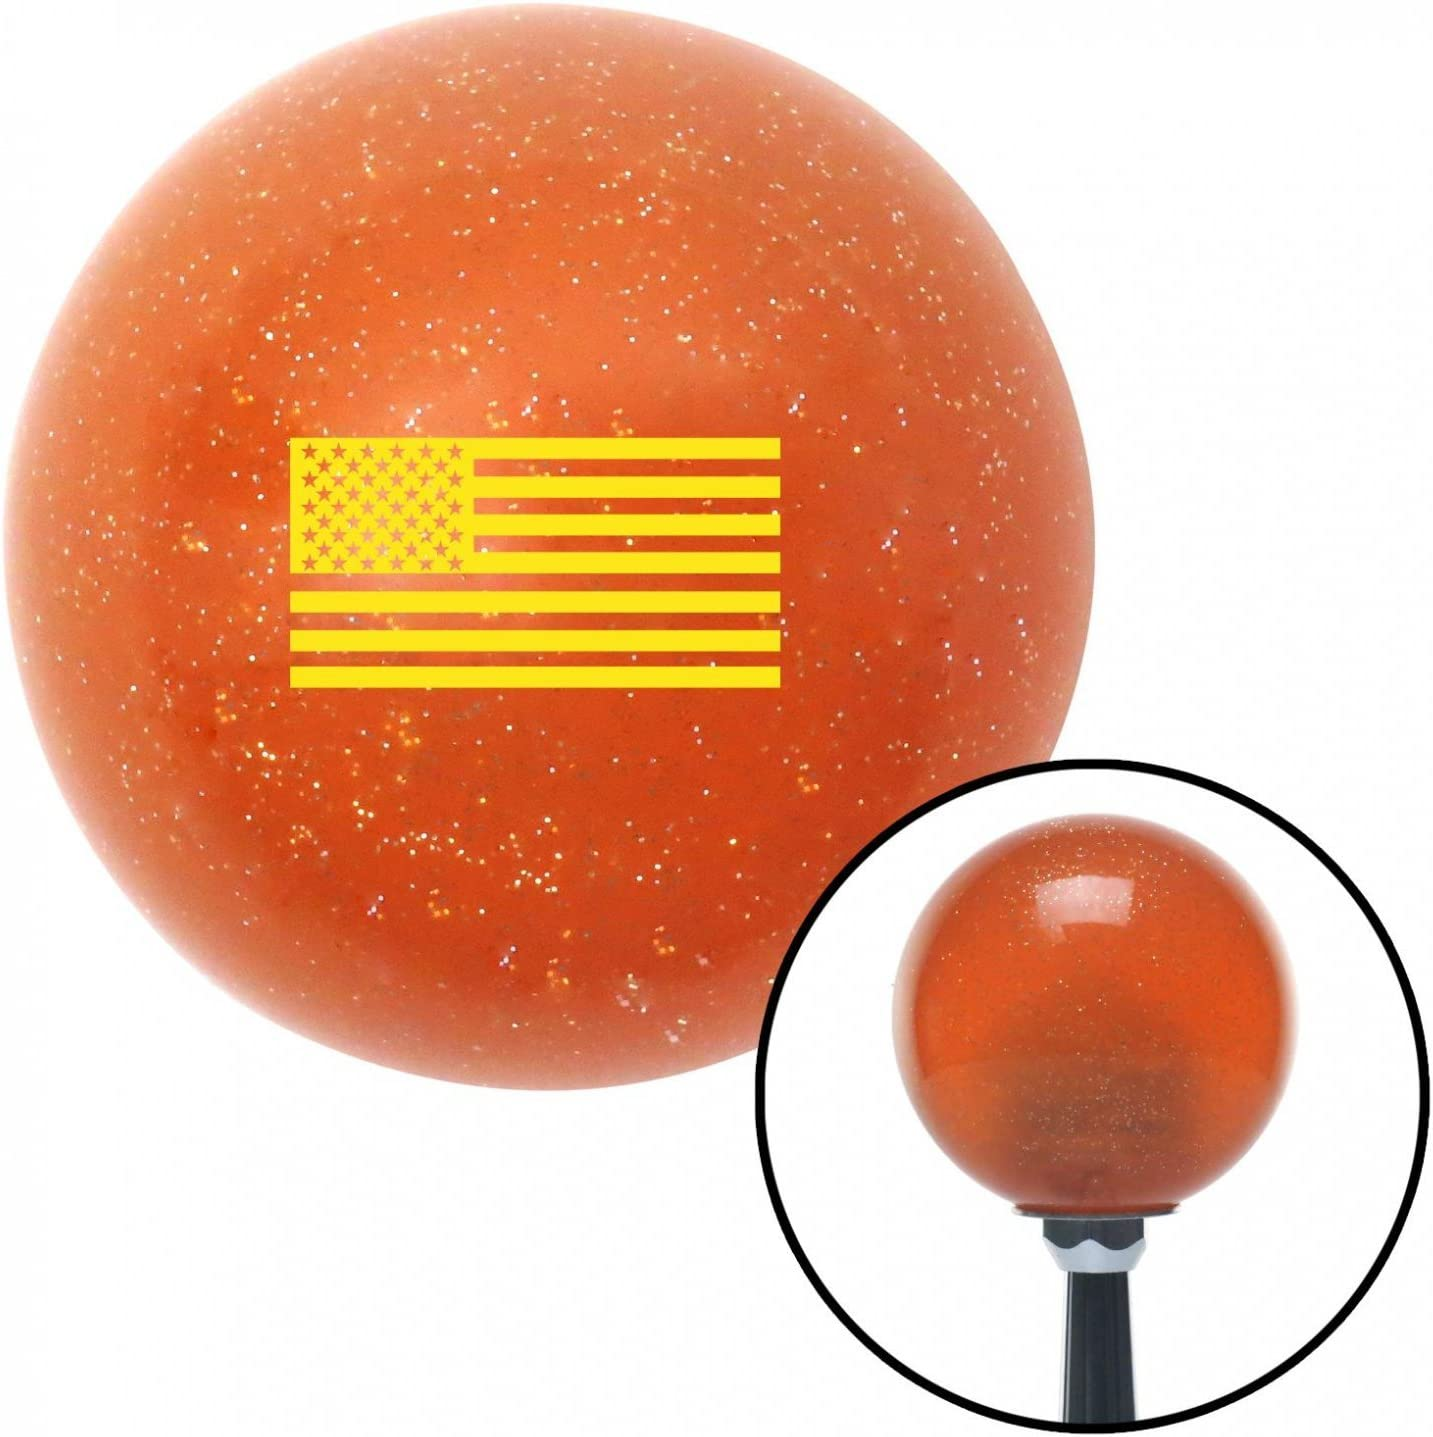 American Shifter 44699 Orange Metal Flake Shift Knob with 16mm x 1.5 Insert Yellow American Flag